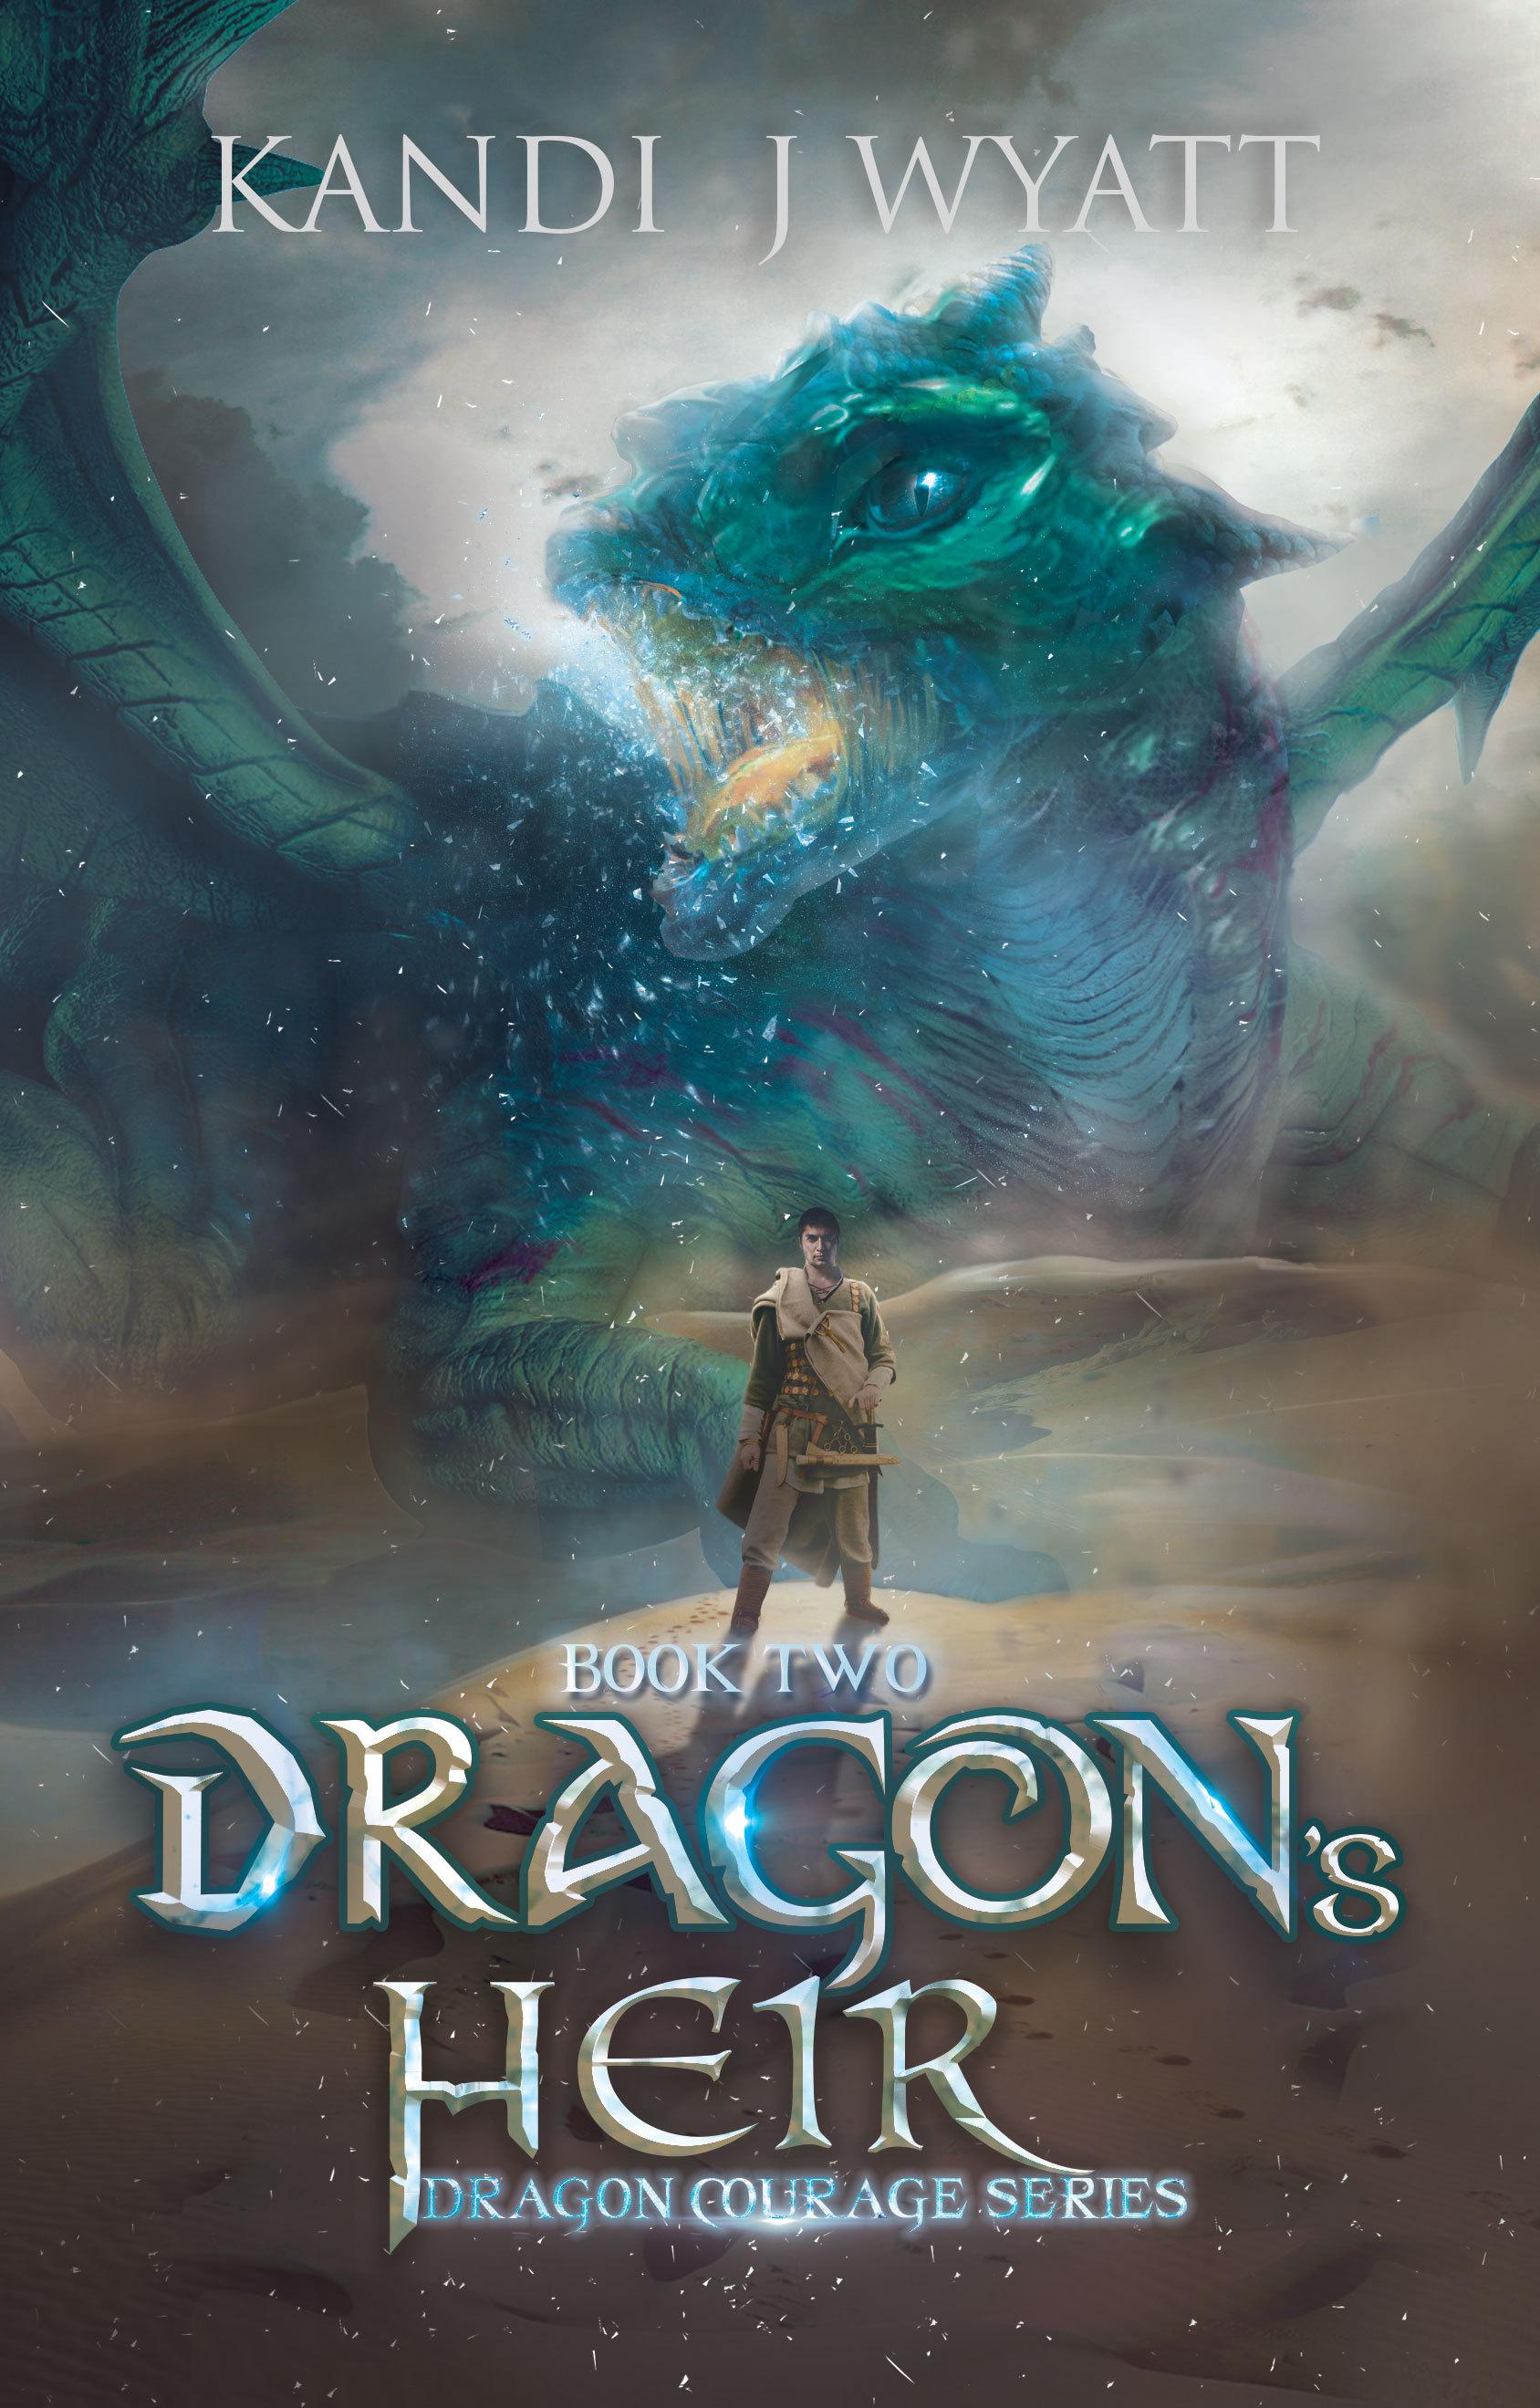 Dragons Heir (Dragon Courage #2) Kandi J. Wyatt